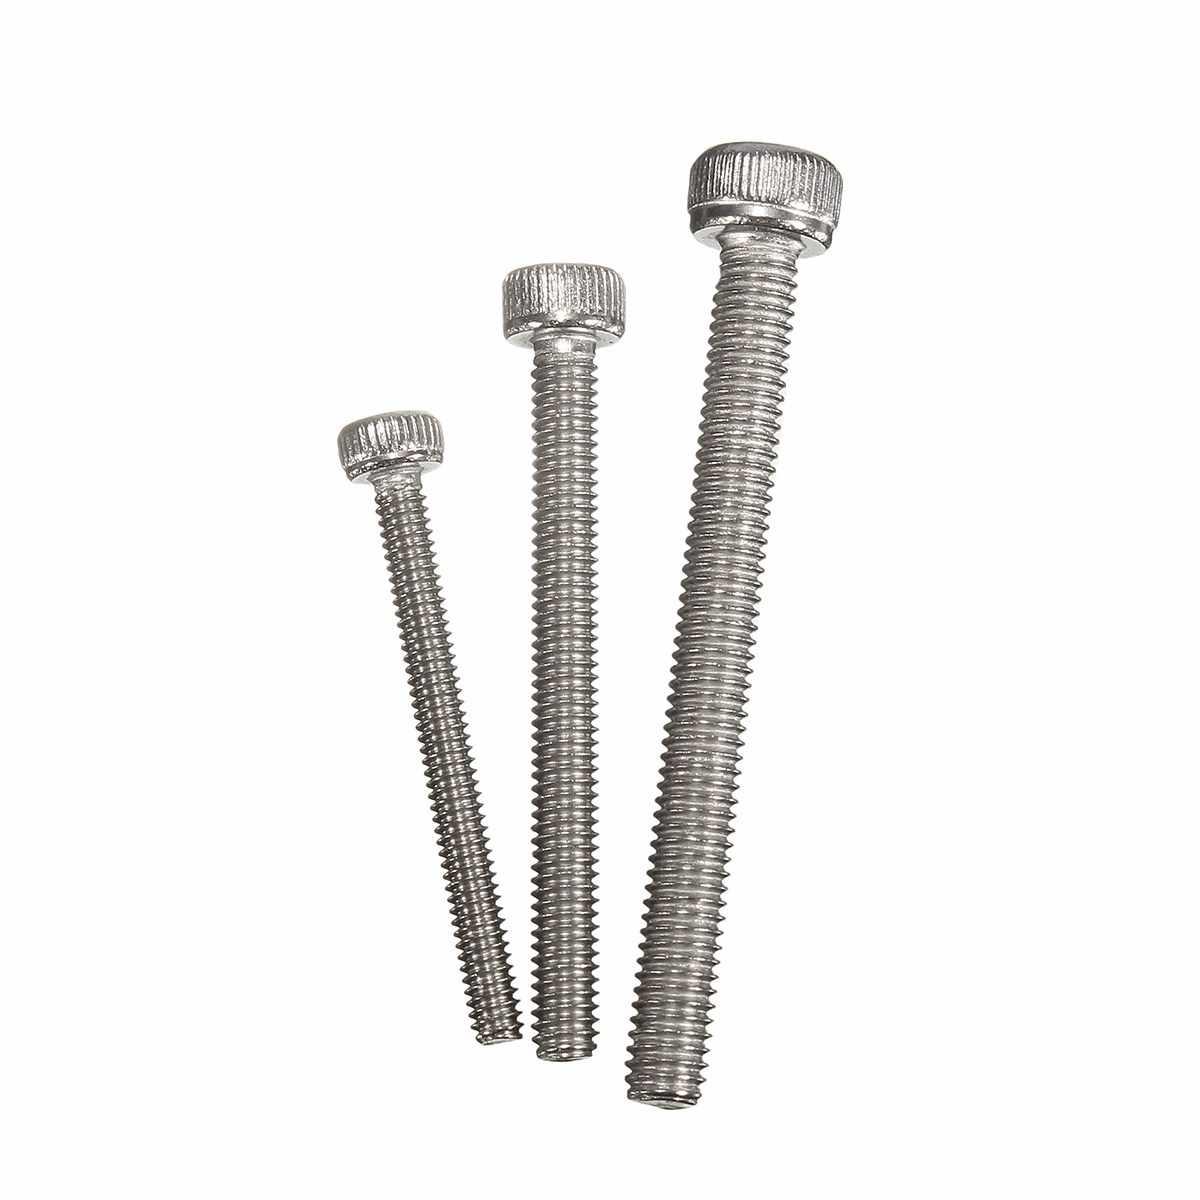 300pcs/box MXSS2 M2/M2.5/M3 Stainless Hex Socket Cap Head Screws Allen bolt Nut Assortment Kit